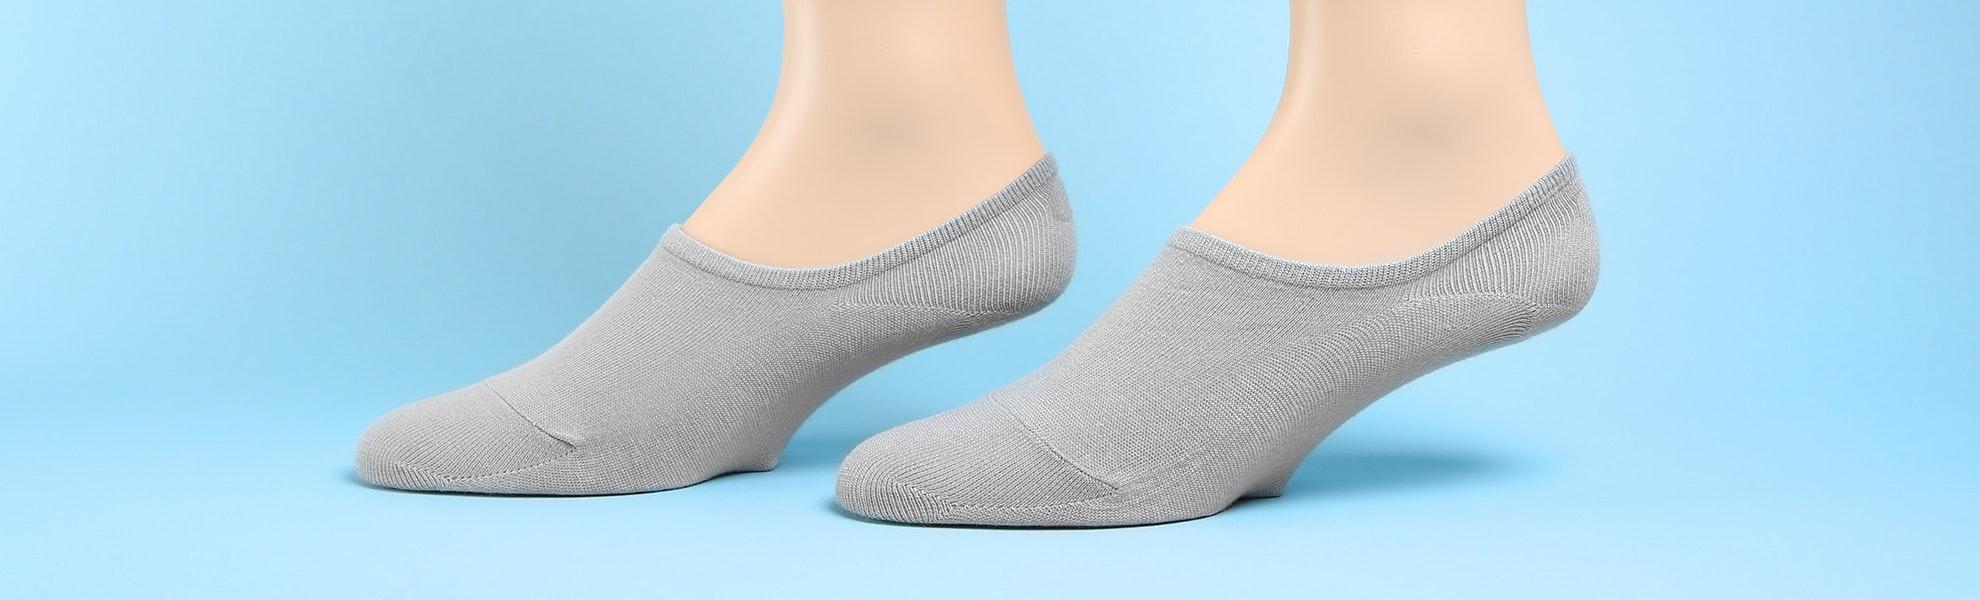 Socksquare No-Show Socks (6-Pairs)